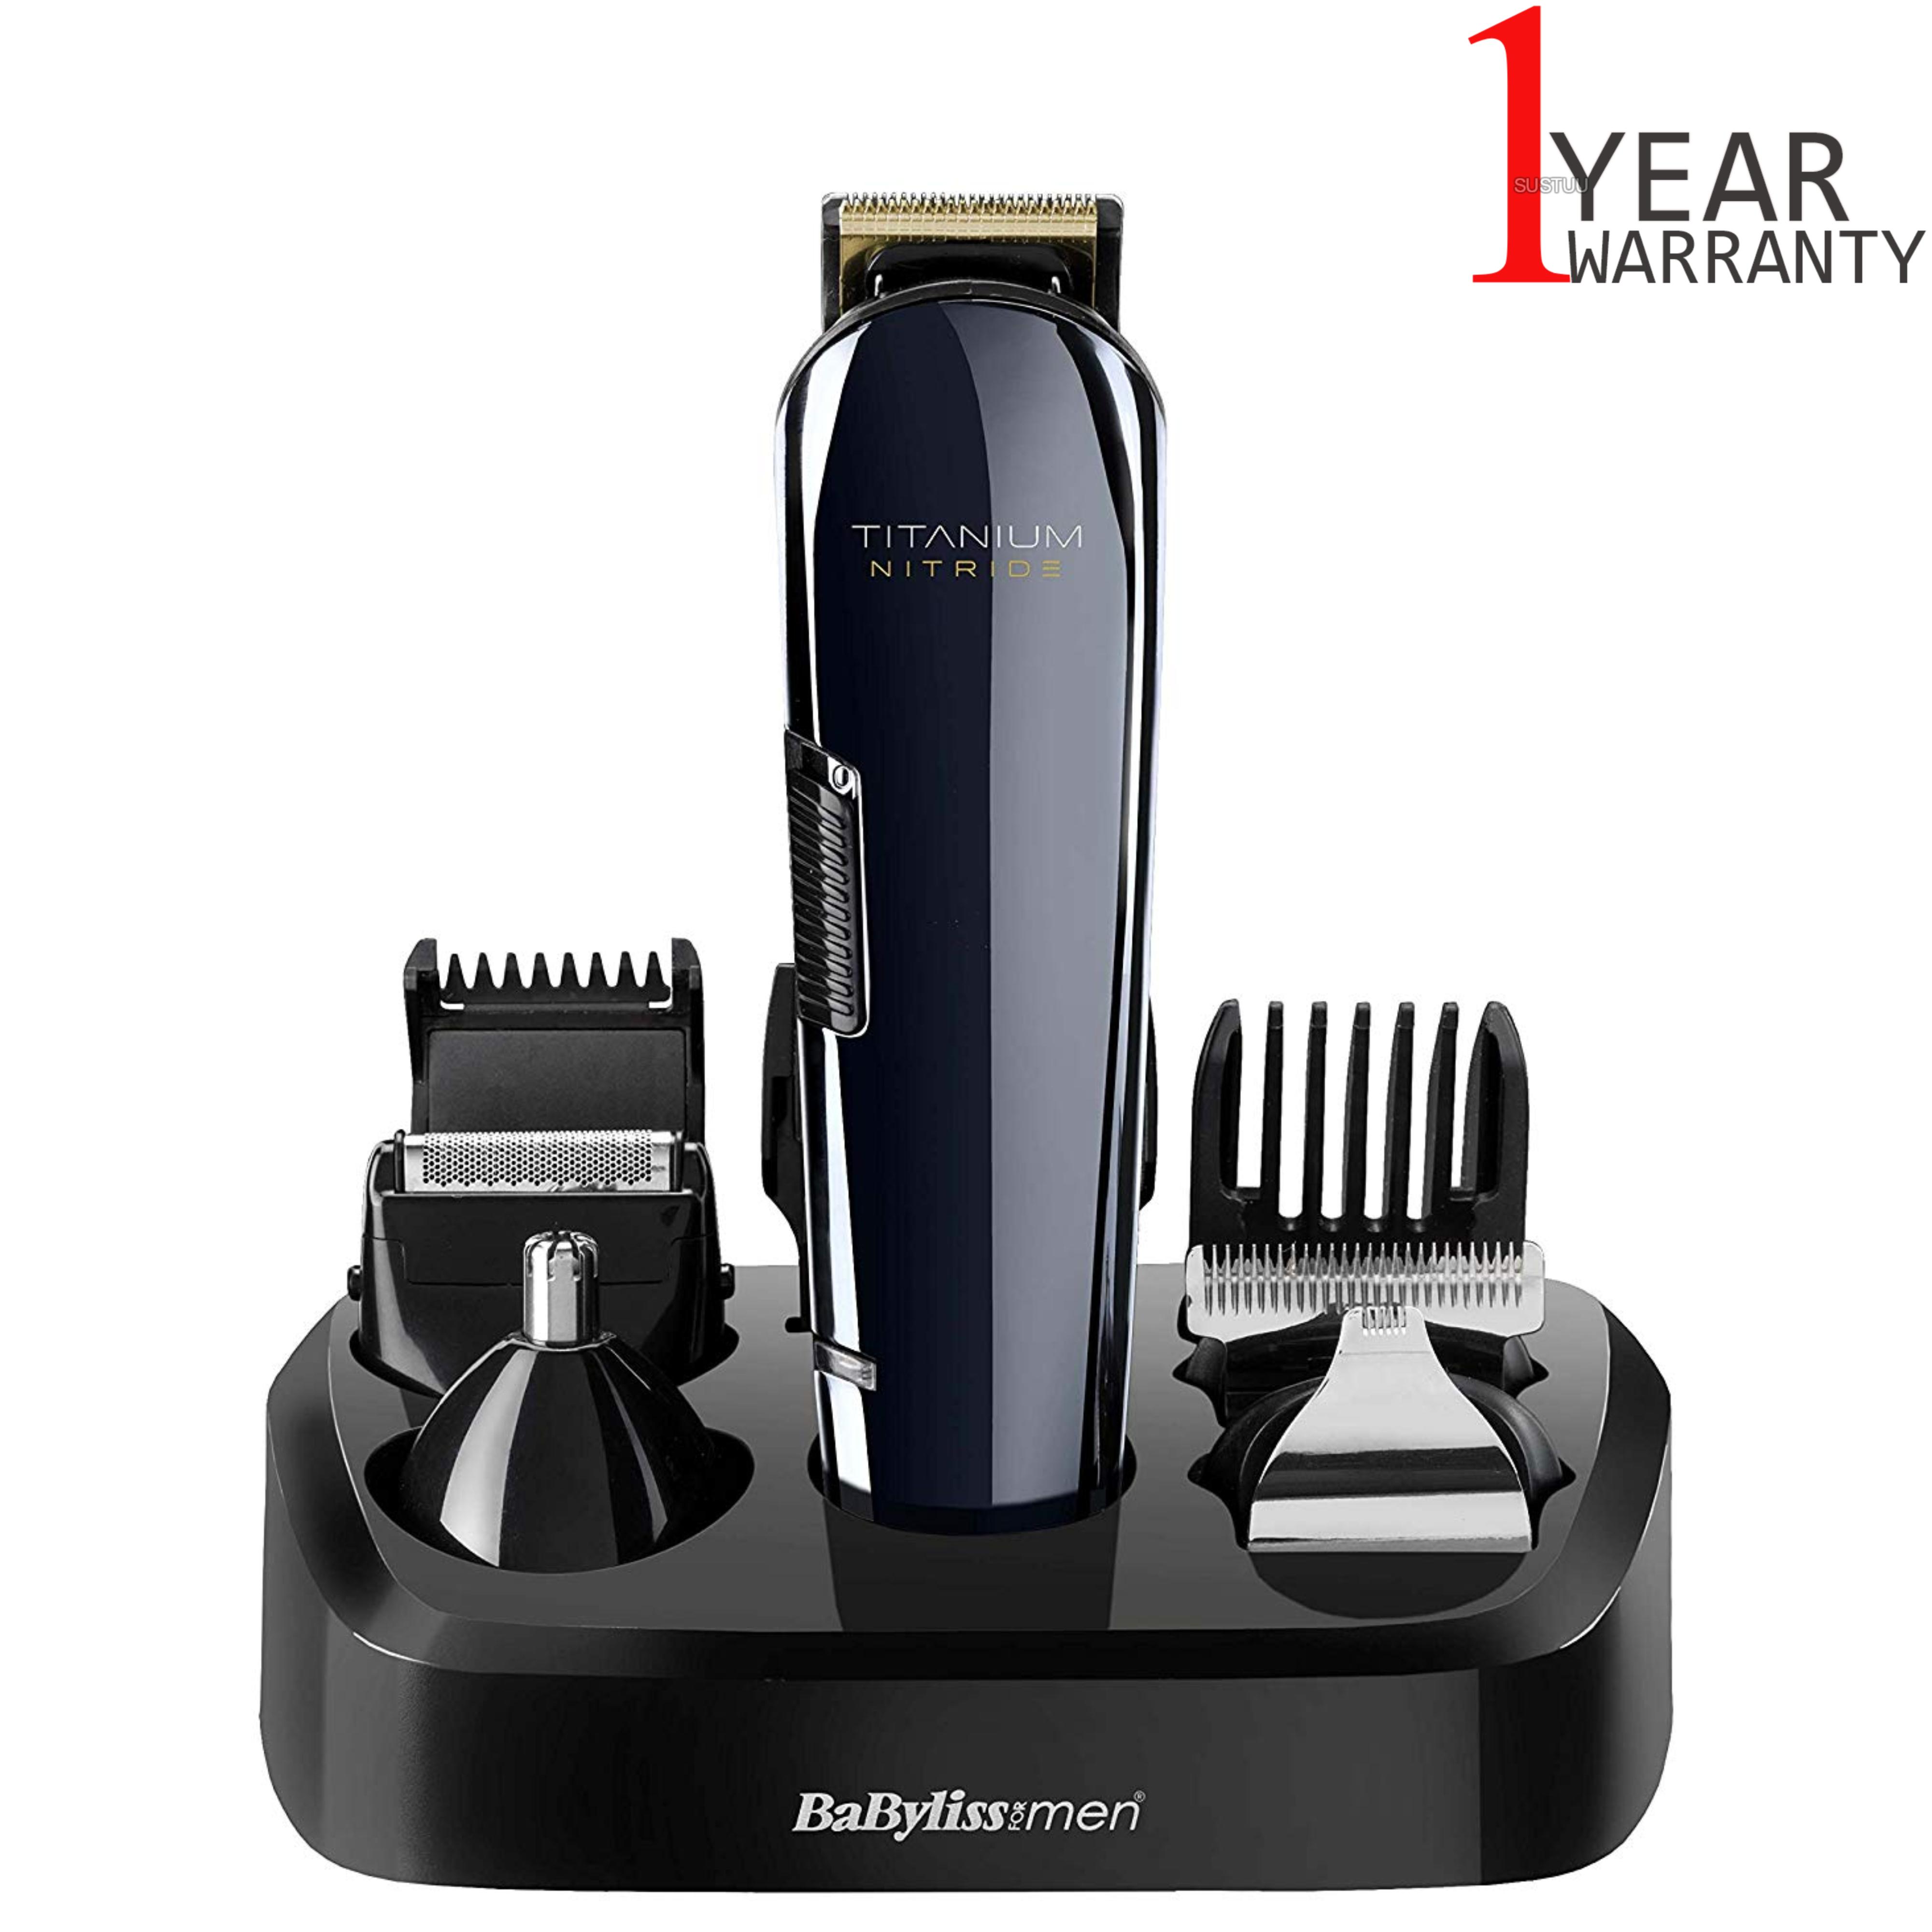 BaByliss 7427U Titanium Nitride Men's Face & Body Cordless Multi Groomer Kit | NEW